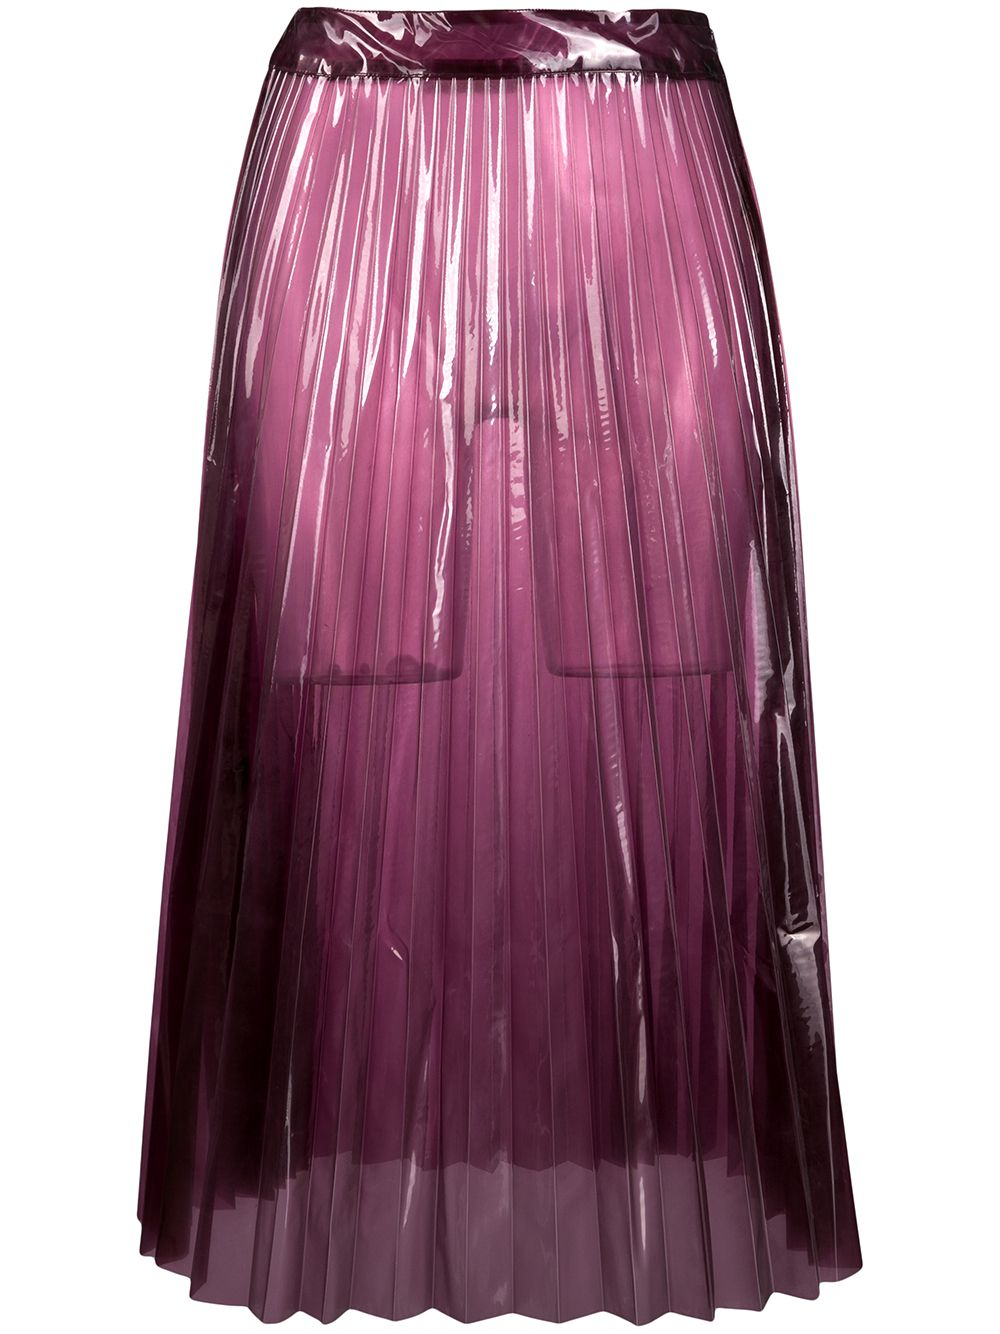 Glasslm Plisse Skirt